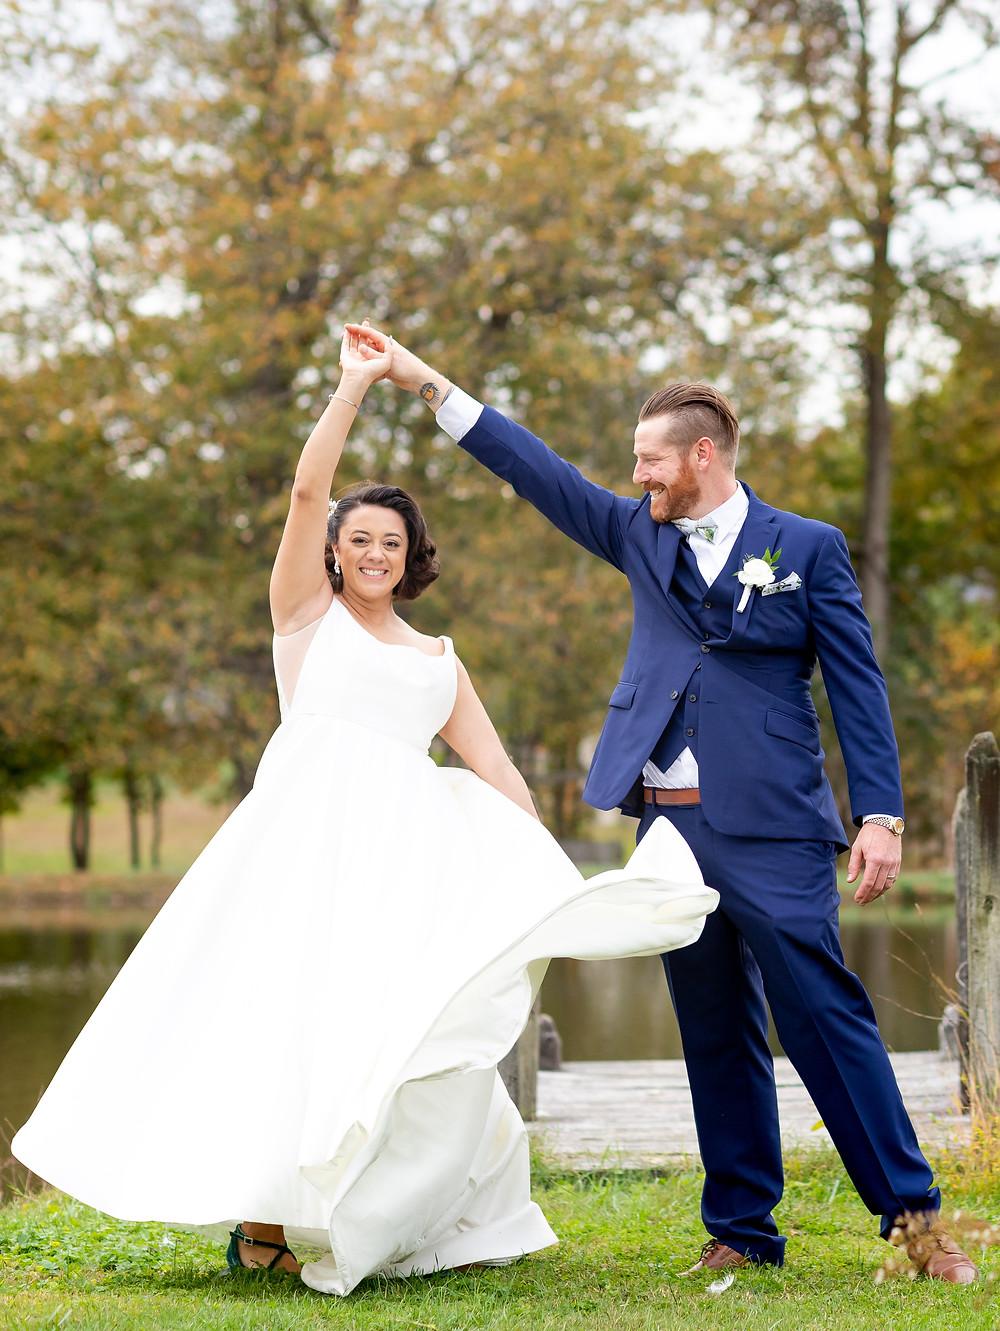 Wedding photography. Bride and groom dancing.